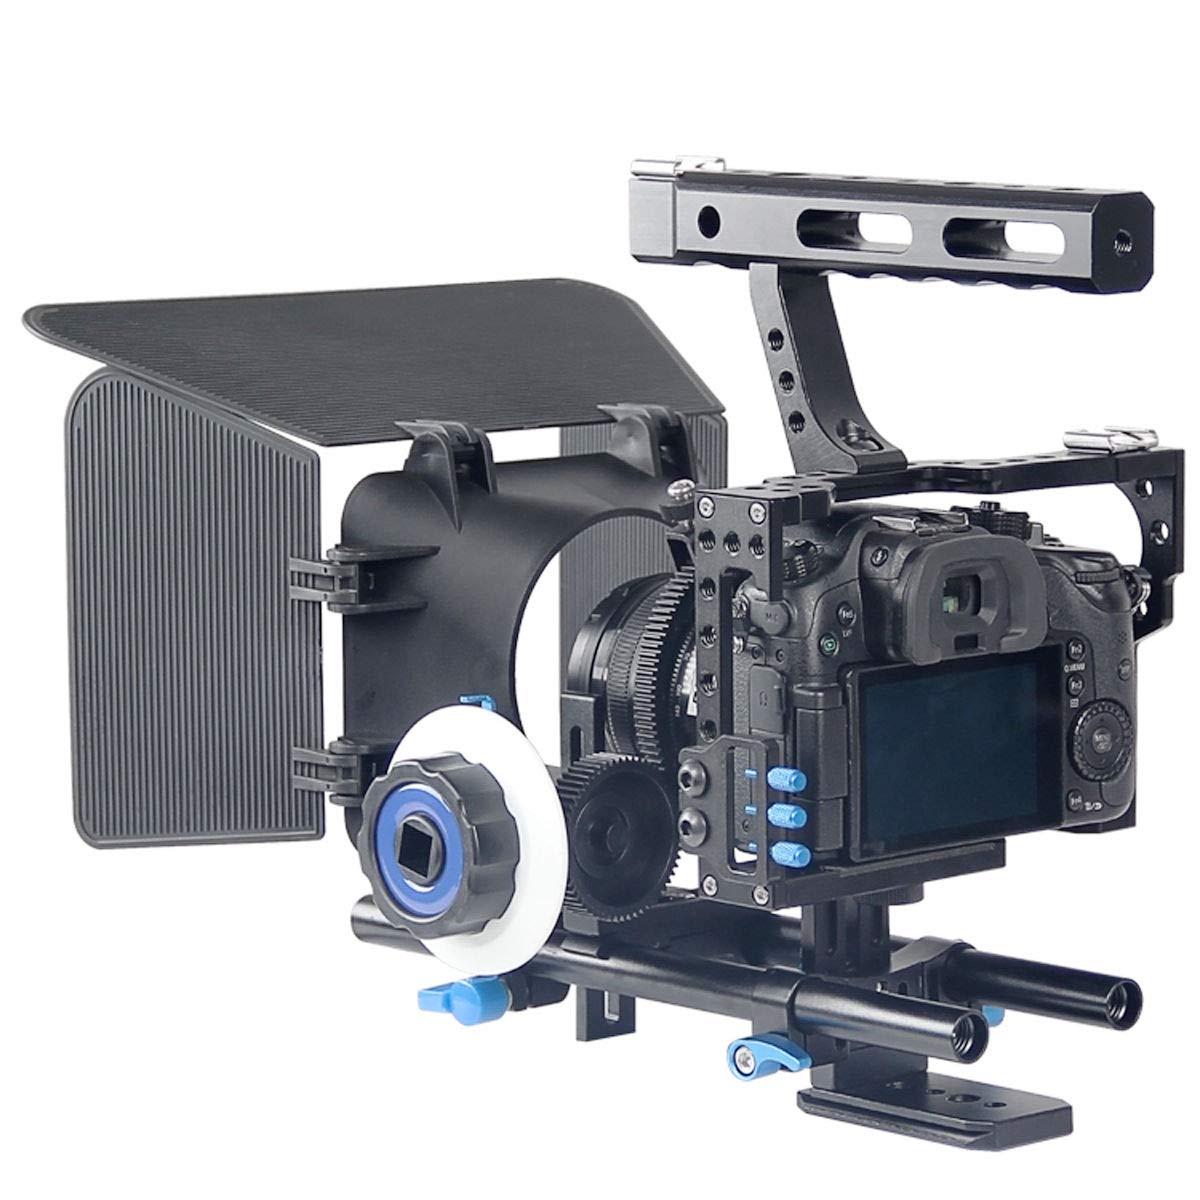 FidgetFidget Stabilizers for DSLR Camera Cage + Follow Focus + Matte Box Kit for Sony A7S A7 A7R A7RII A7SII by FidgetFidget (Image #2)